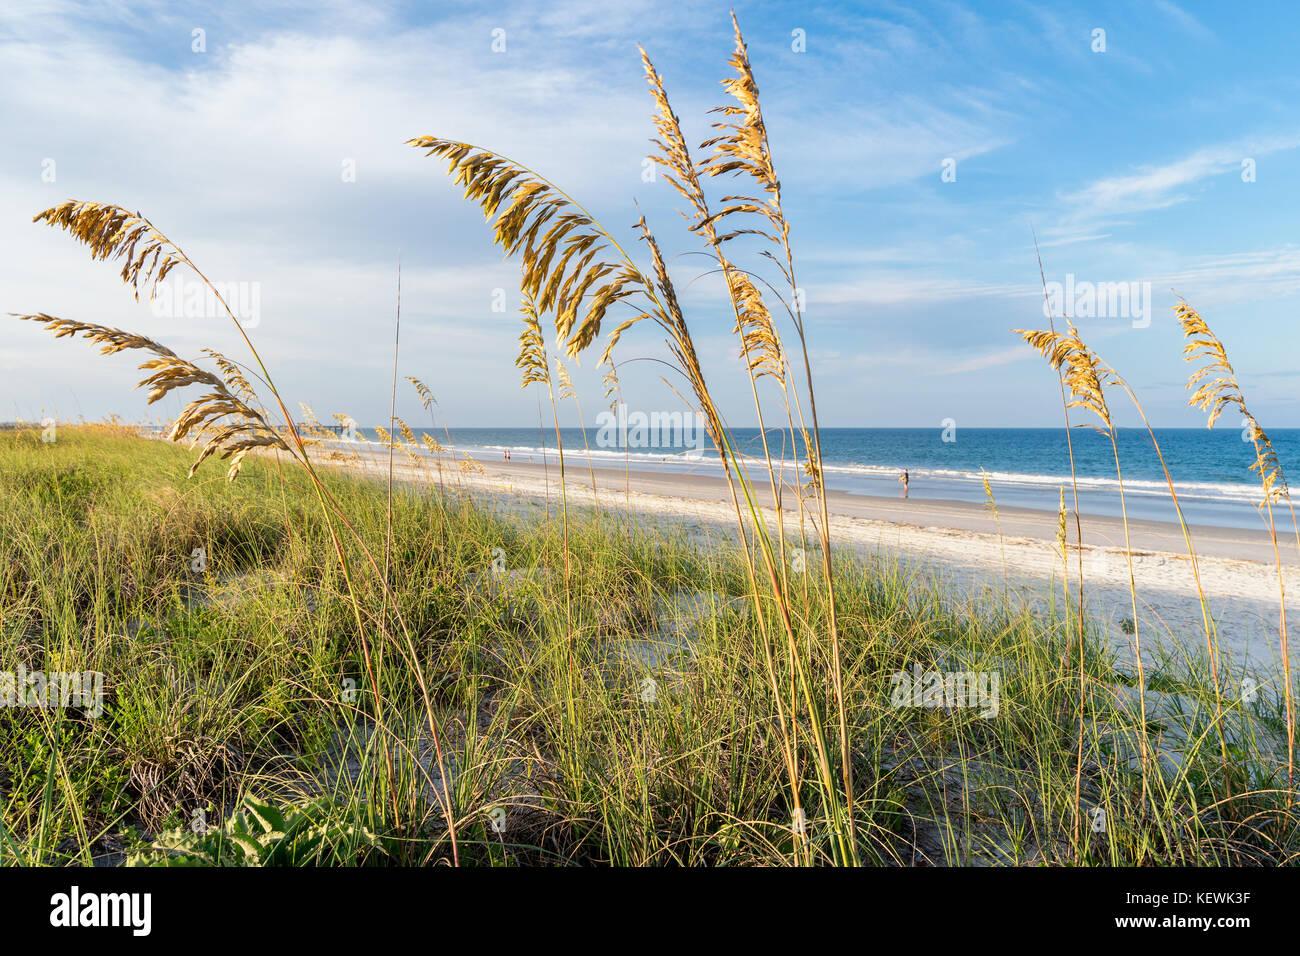 Sea Oats frame the beautiful beaches along Amelia Island, Florida - Stock Image